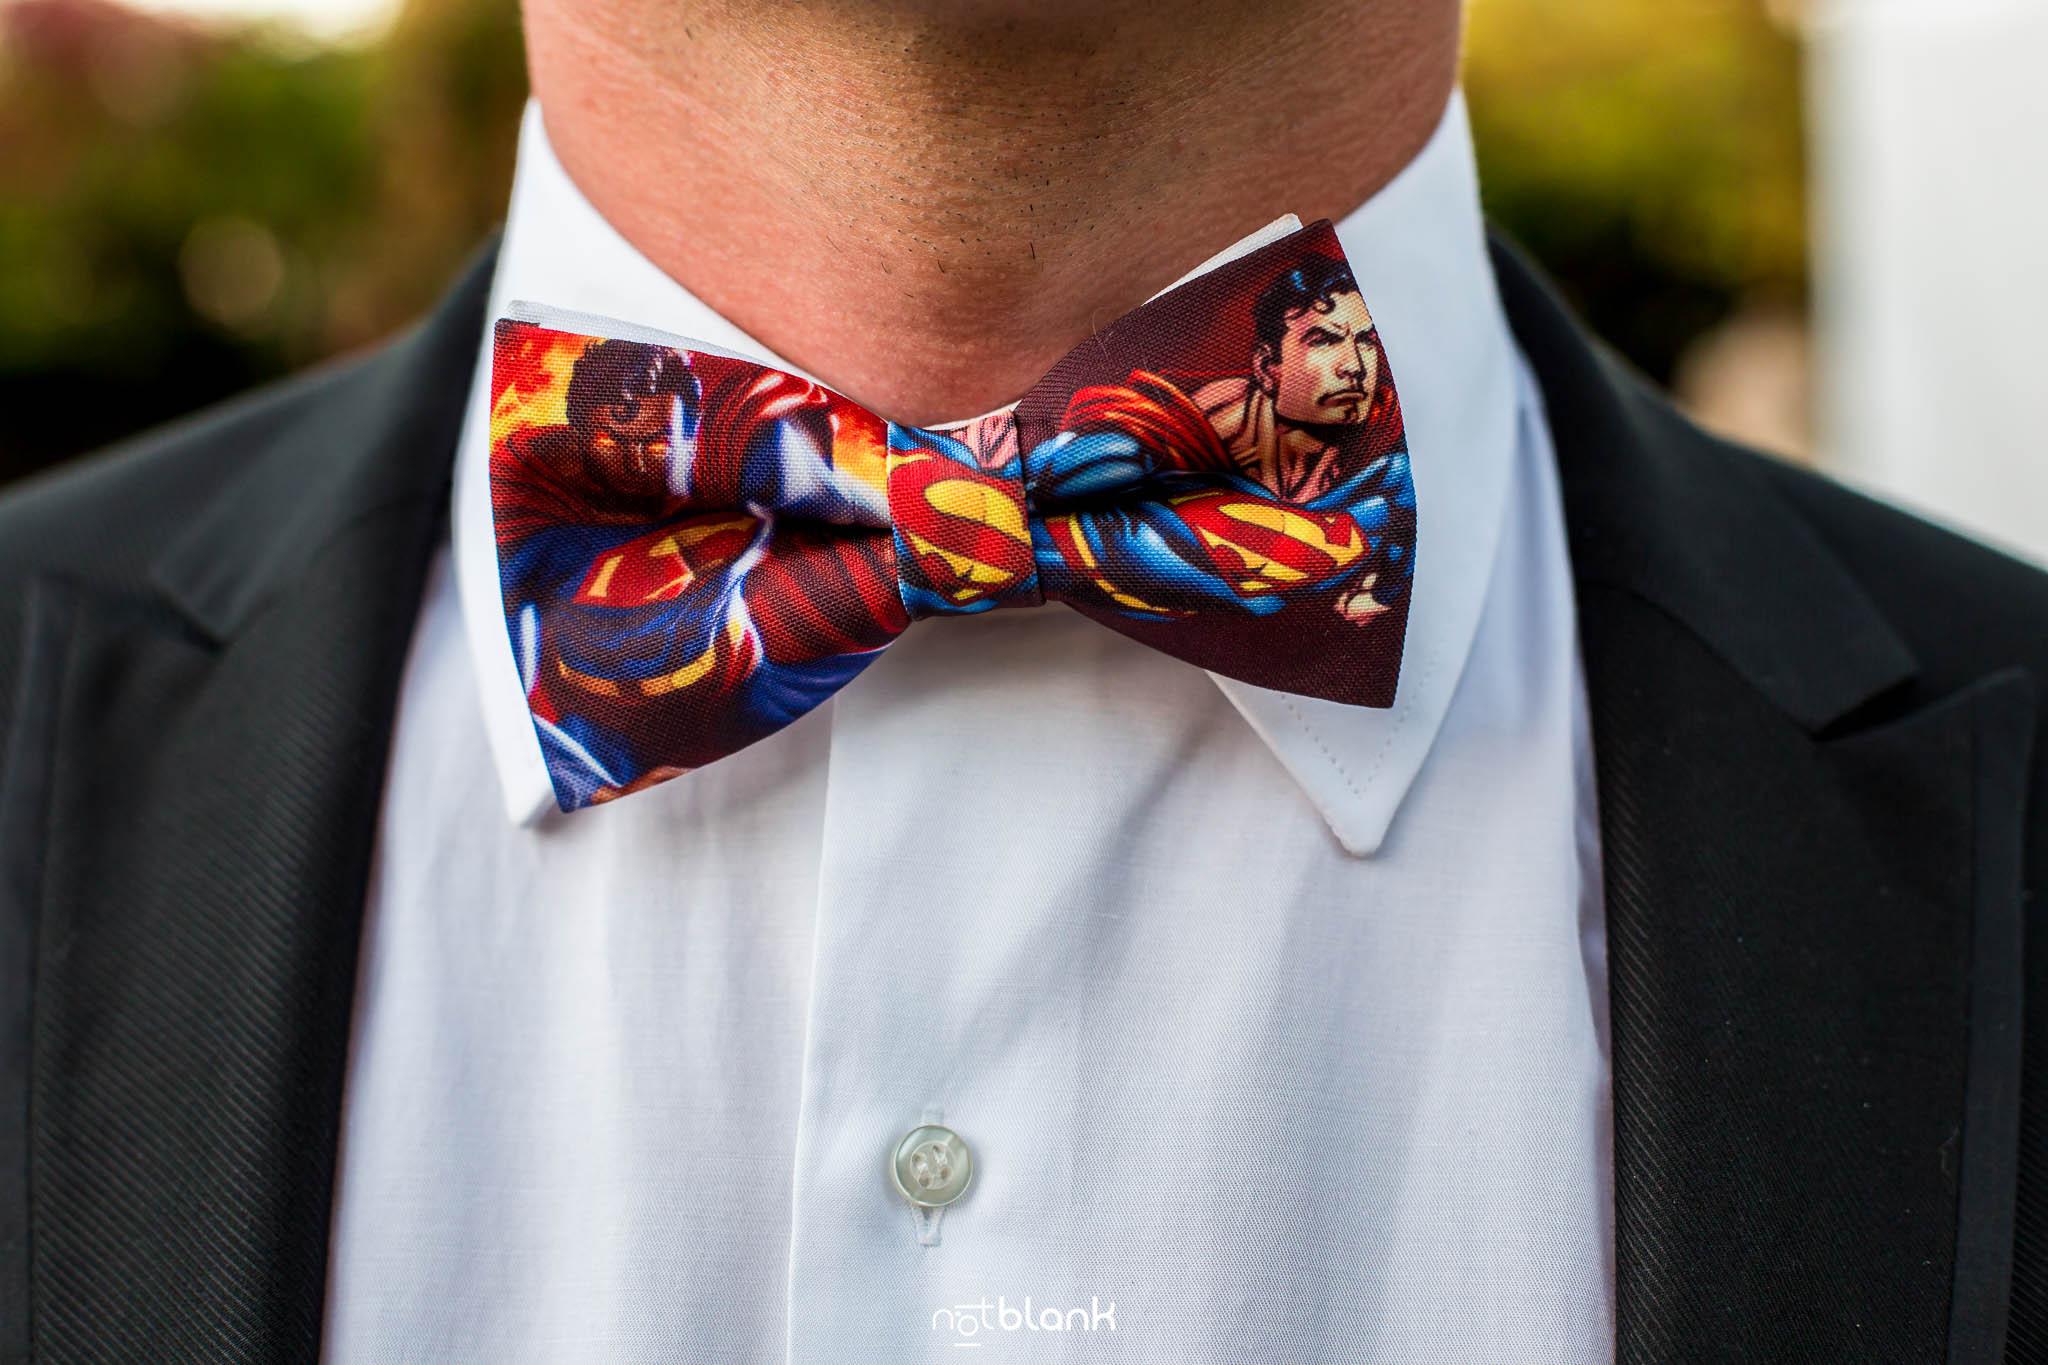 Notblank-Boda Tematica-Star Wars-Malaposta-Portugal-Fotógrafo de boda-Invitado-Pajarita-Detalle-Superman-Super héroe